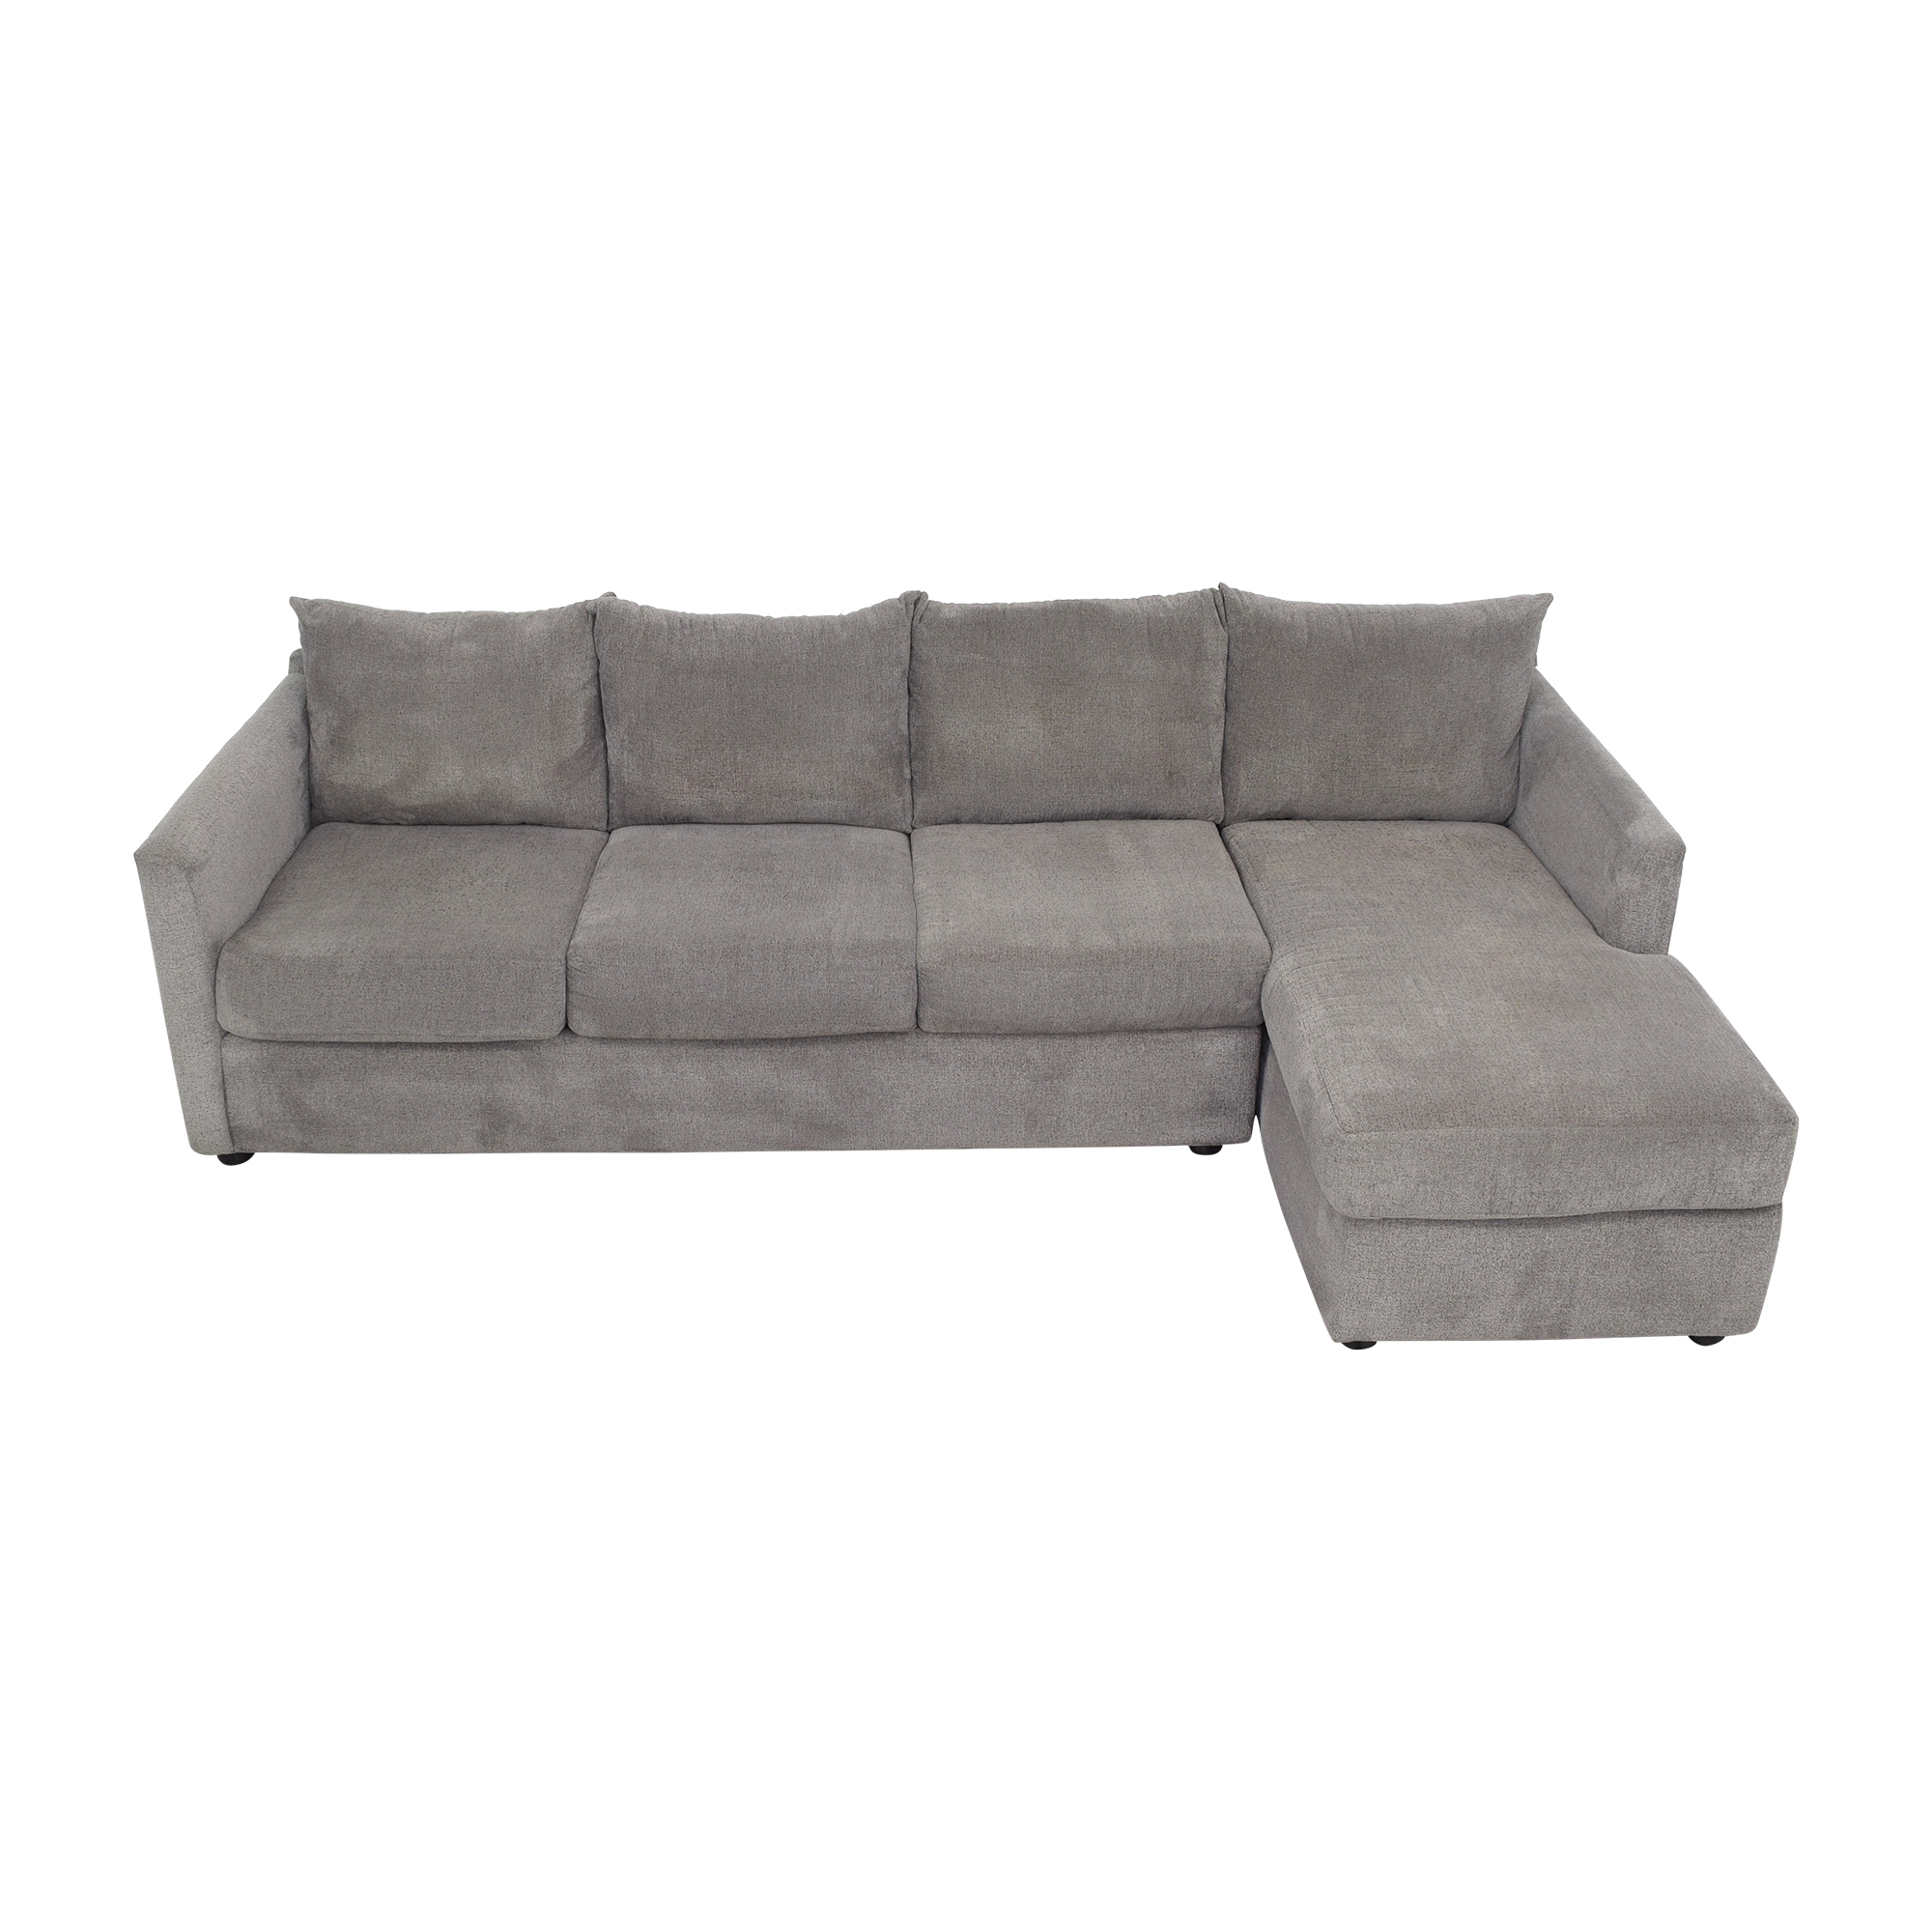 KFI KFI Sectional Chaise Sofa nj